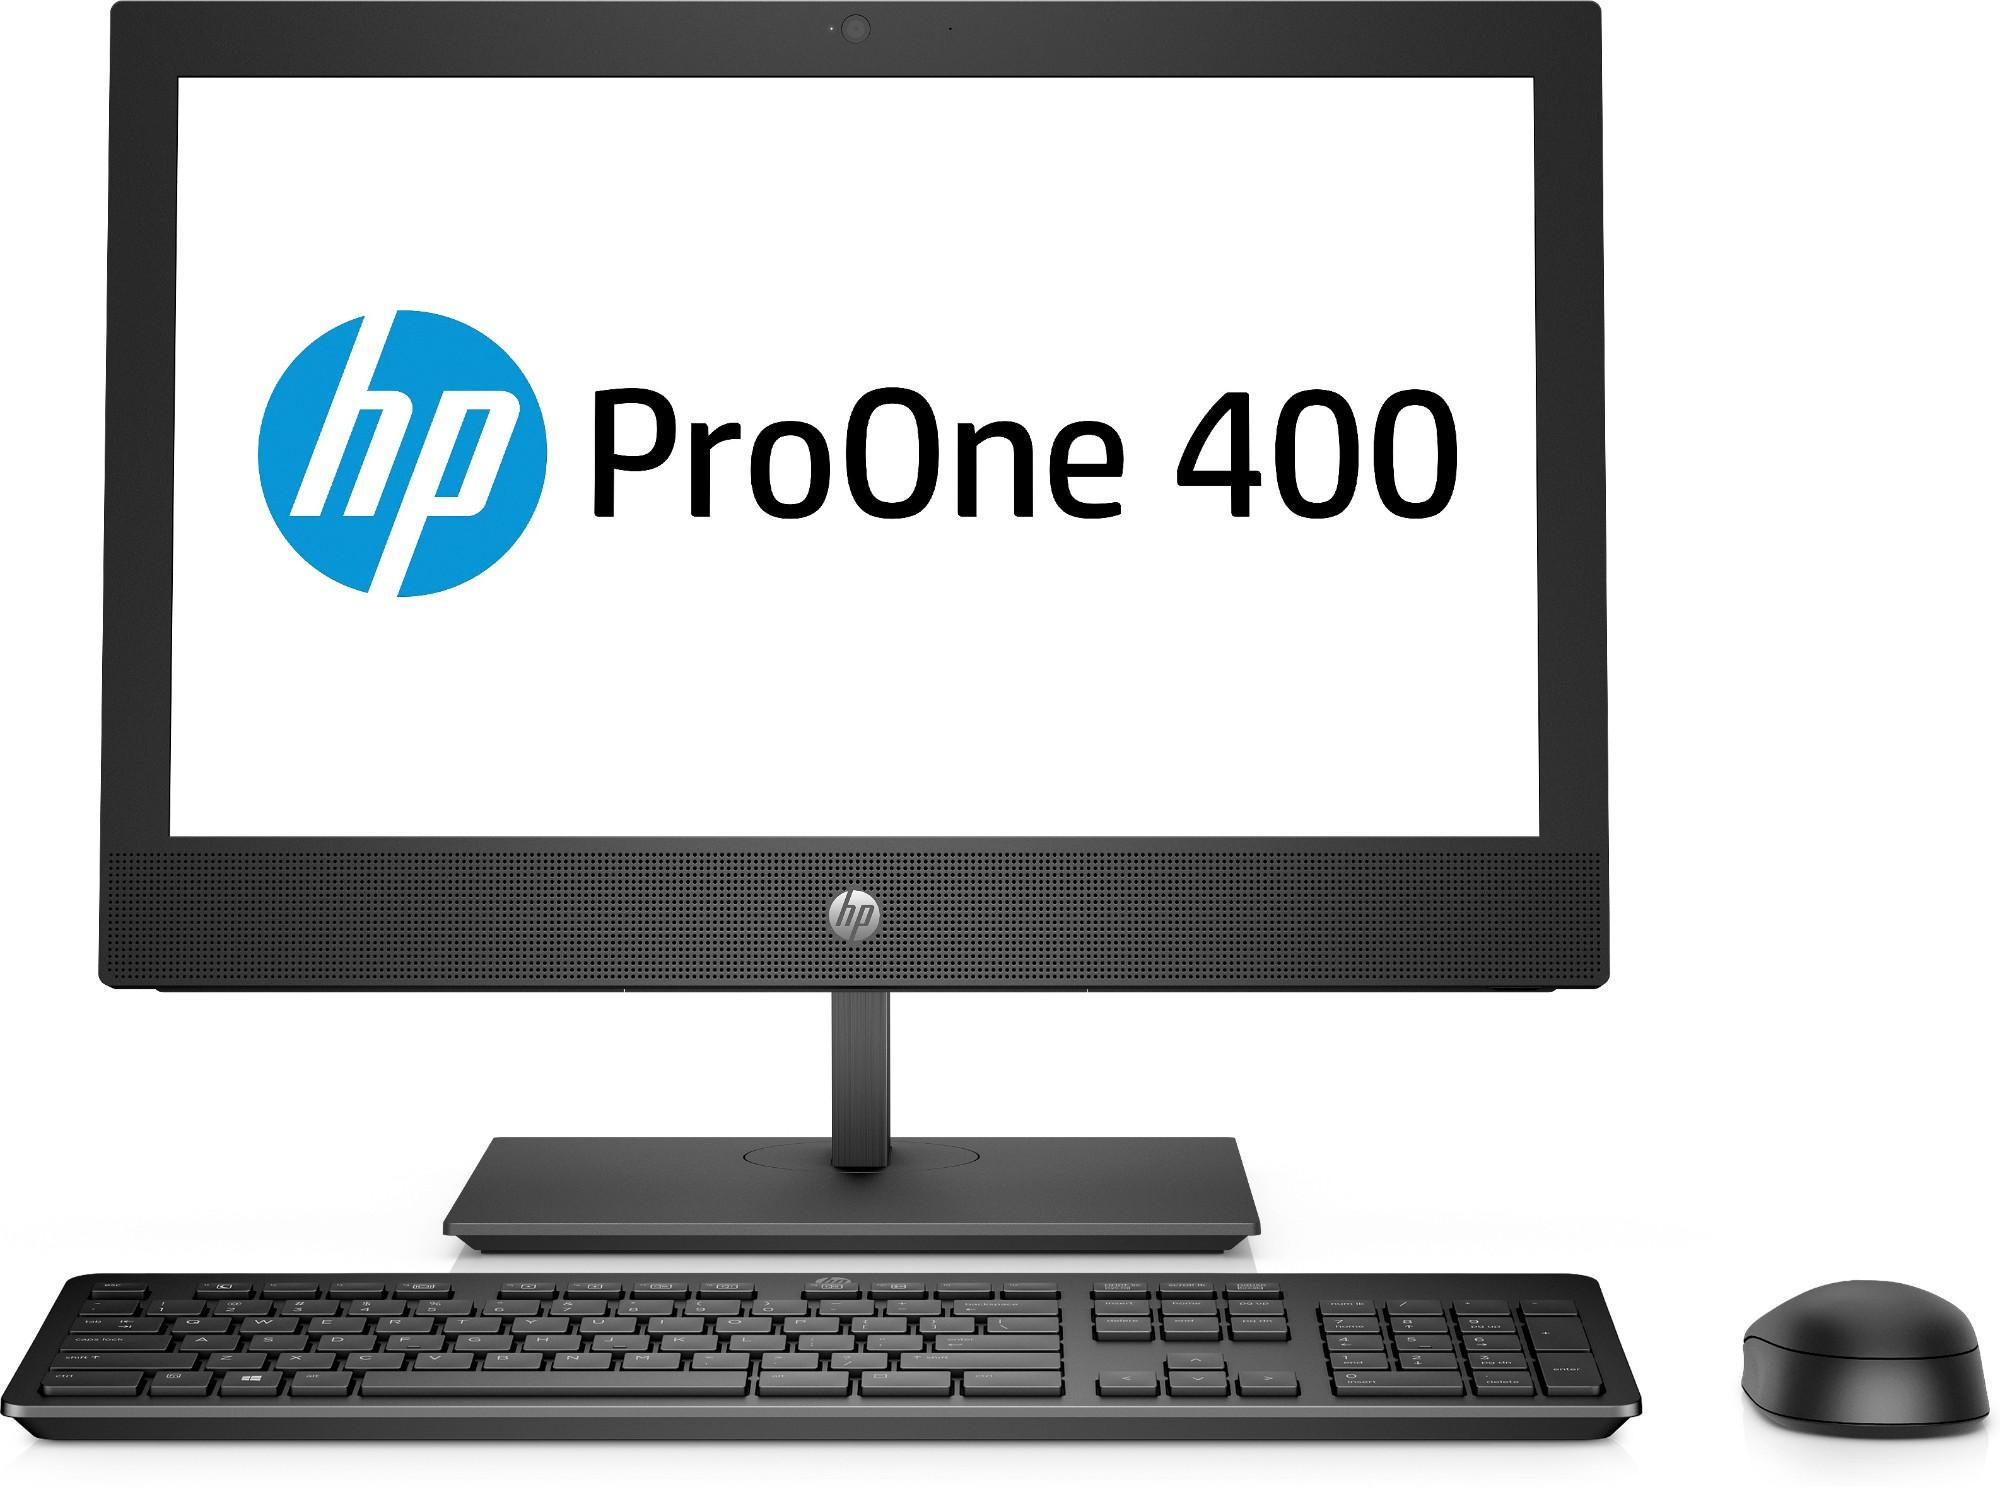 HP ProOne 400 G4 2.1GHz i5-8500T 8th gen Intel® Core™ i5 20